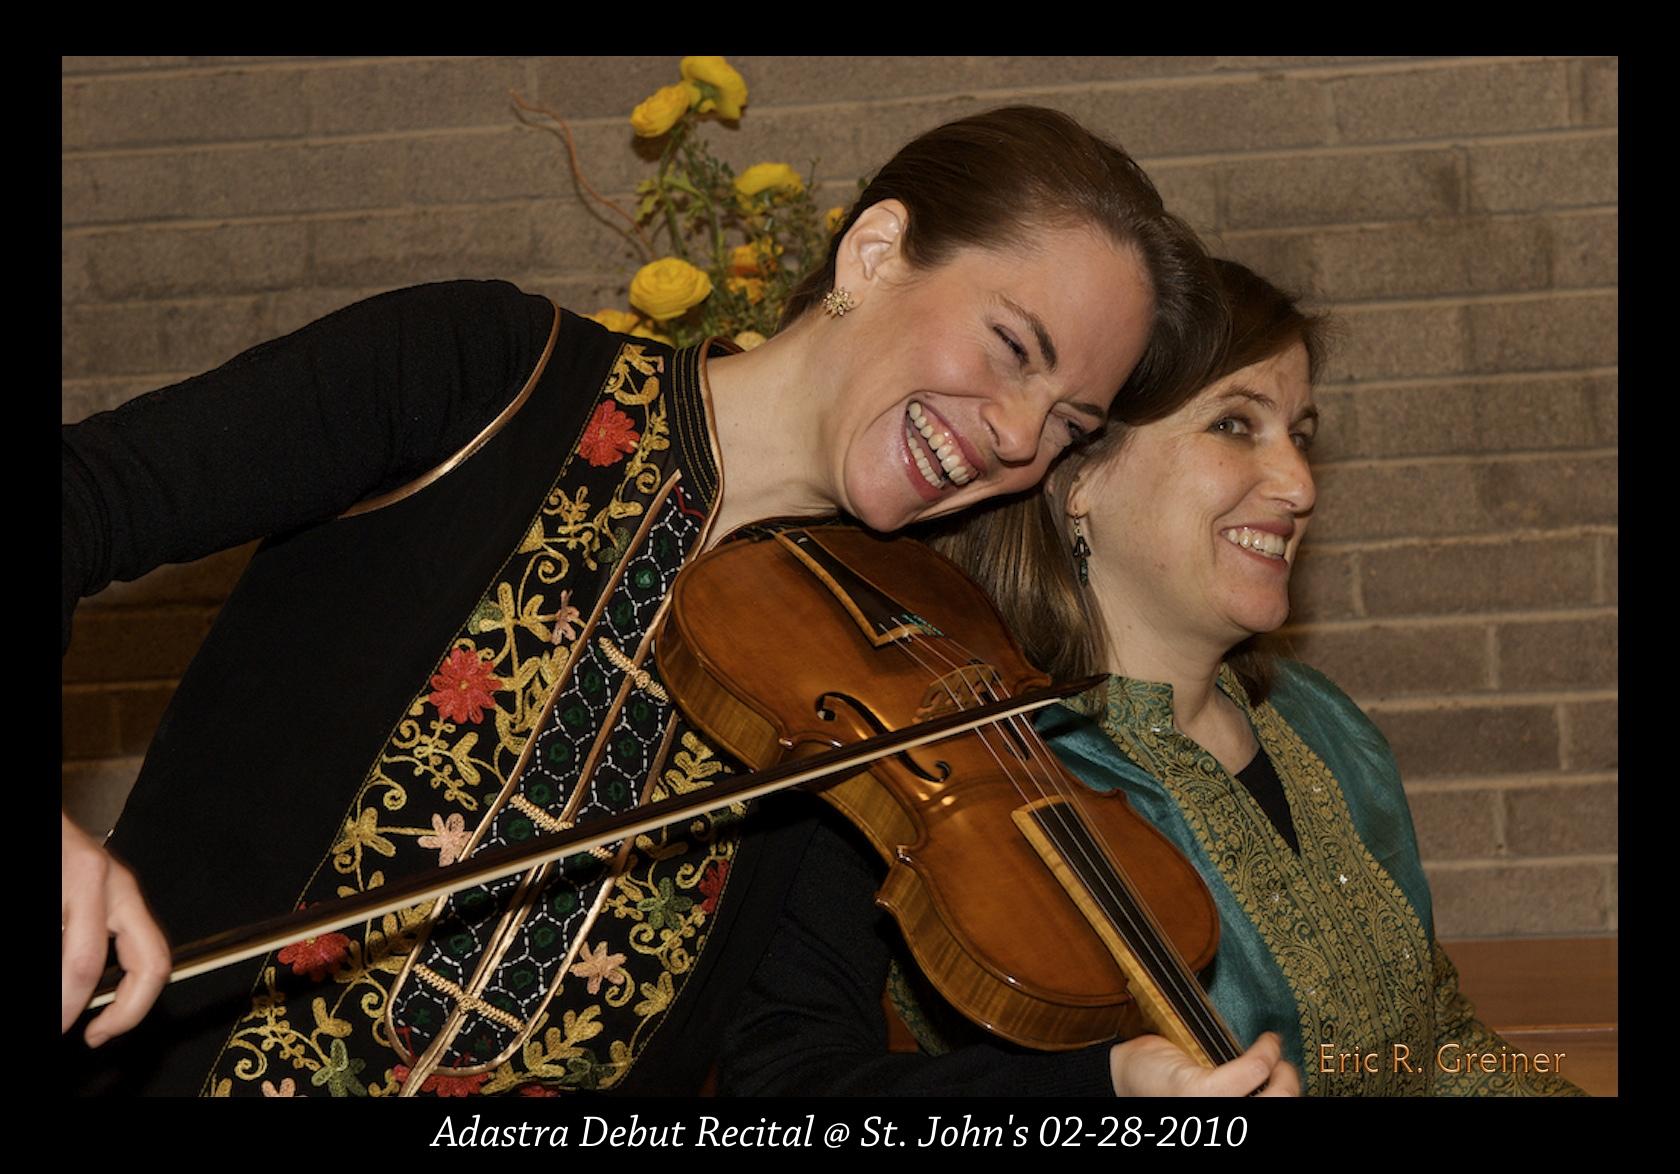 Adastra, a Period Instrument Duo